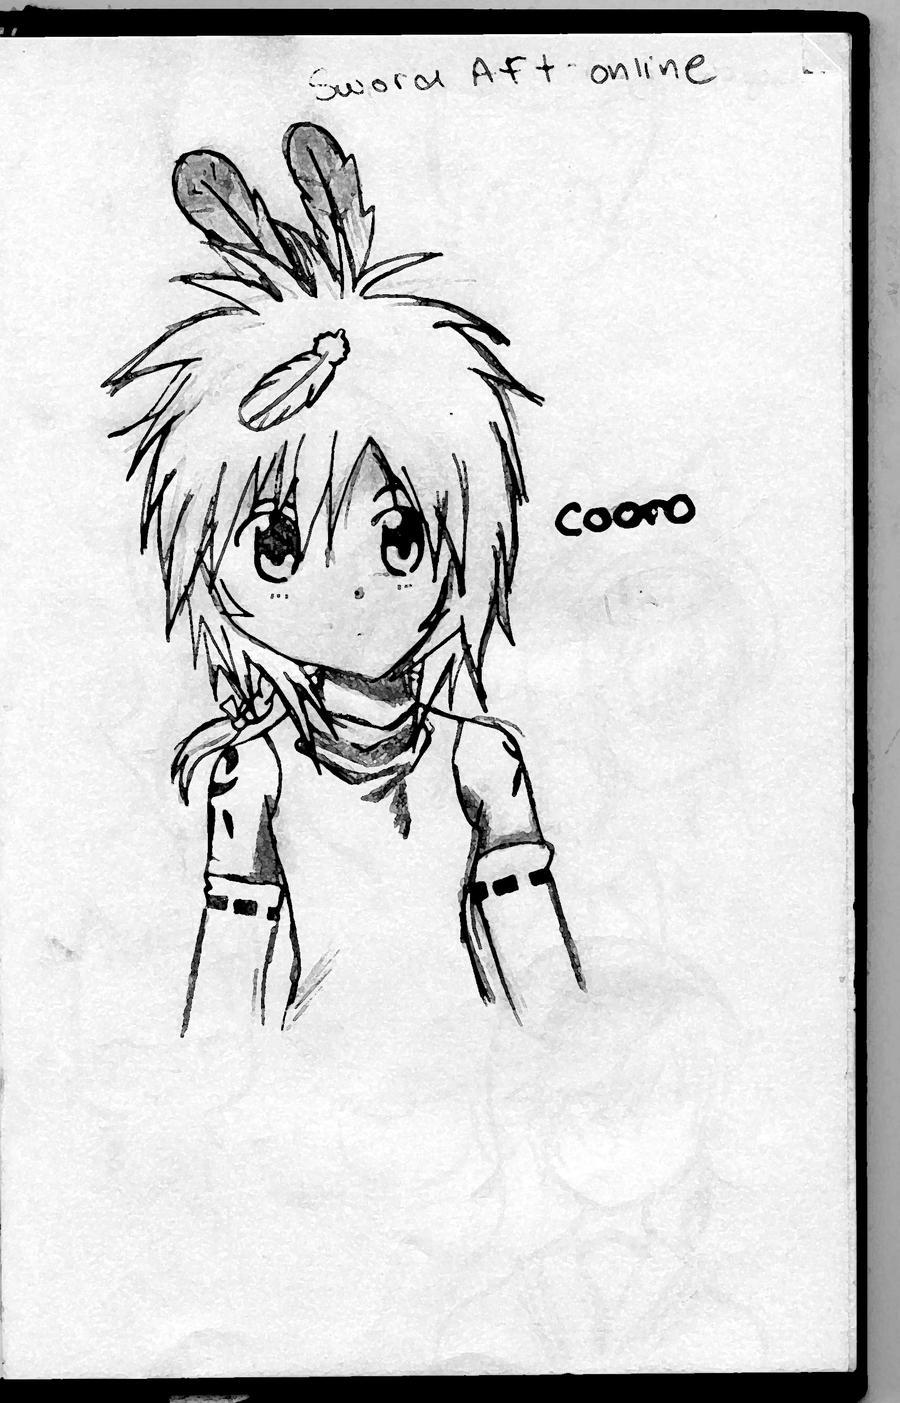 cooro by ChibiConan